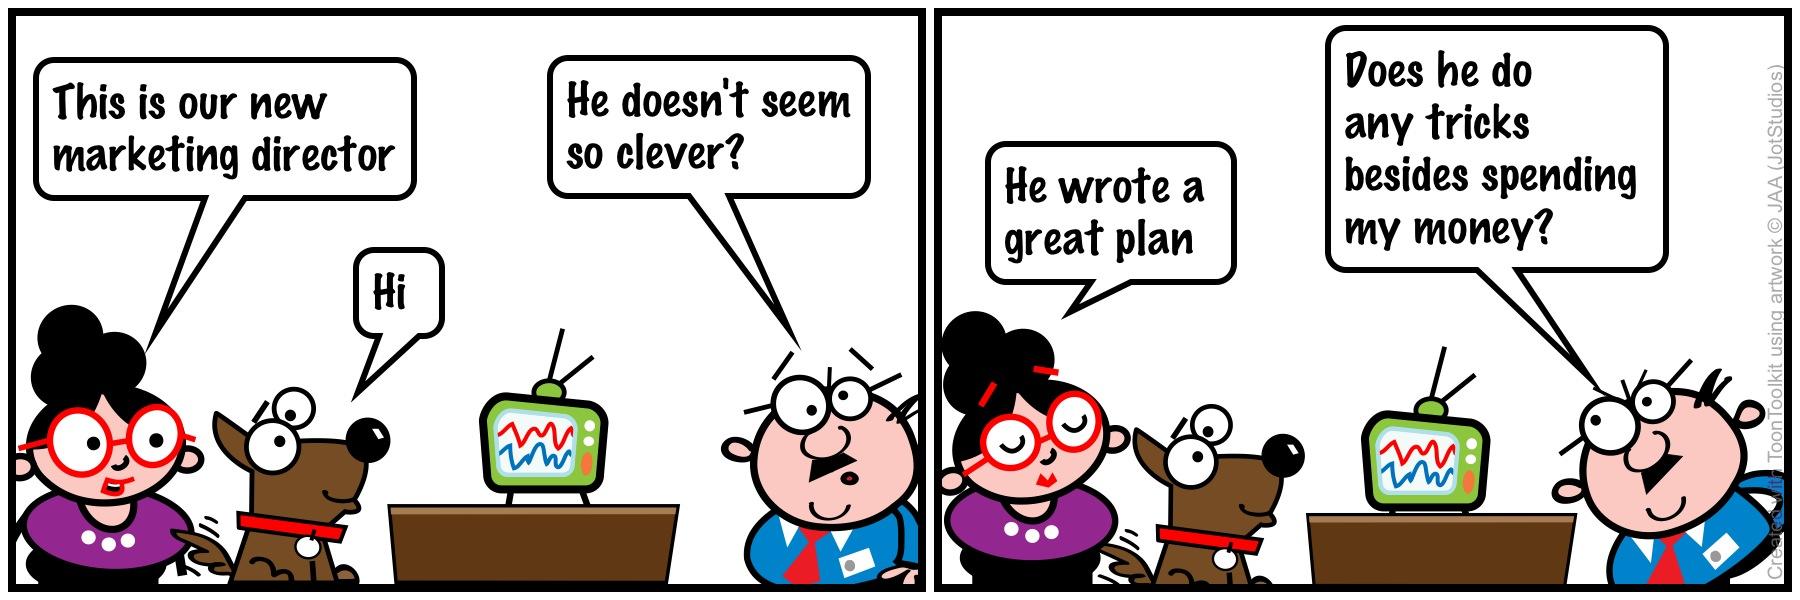 CMO comic